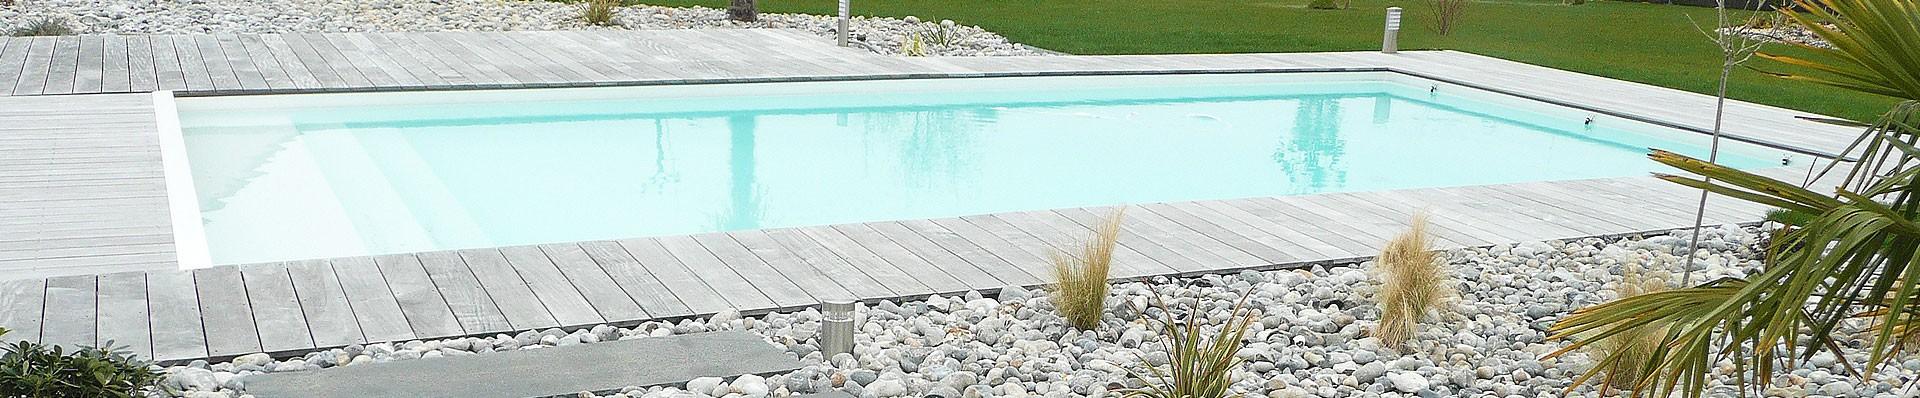 Installation de piscine à Angers